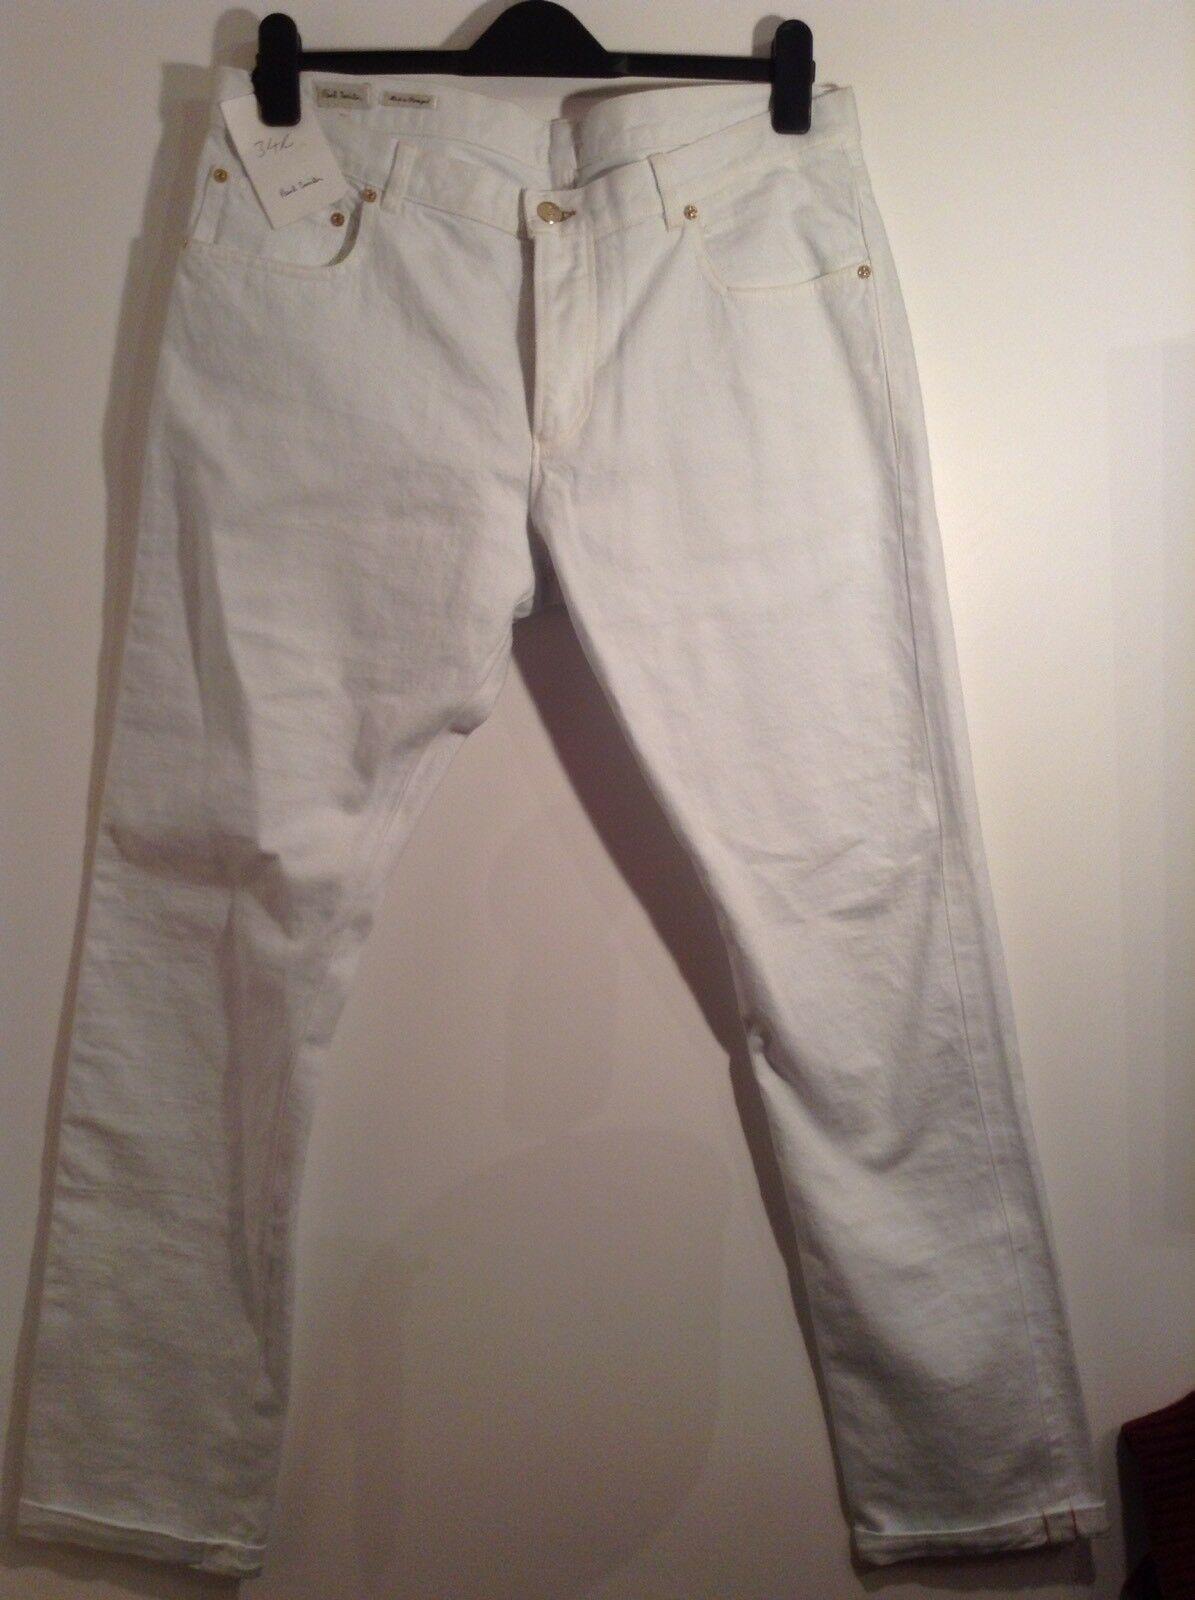 BNWT 100% Auth Paul Smith, da uomo uomo uomo bianca CONO Fit Jeans. 34 RRP .00 d1b5bb